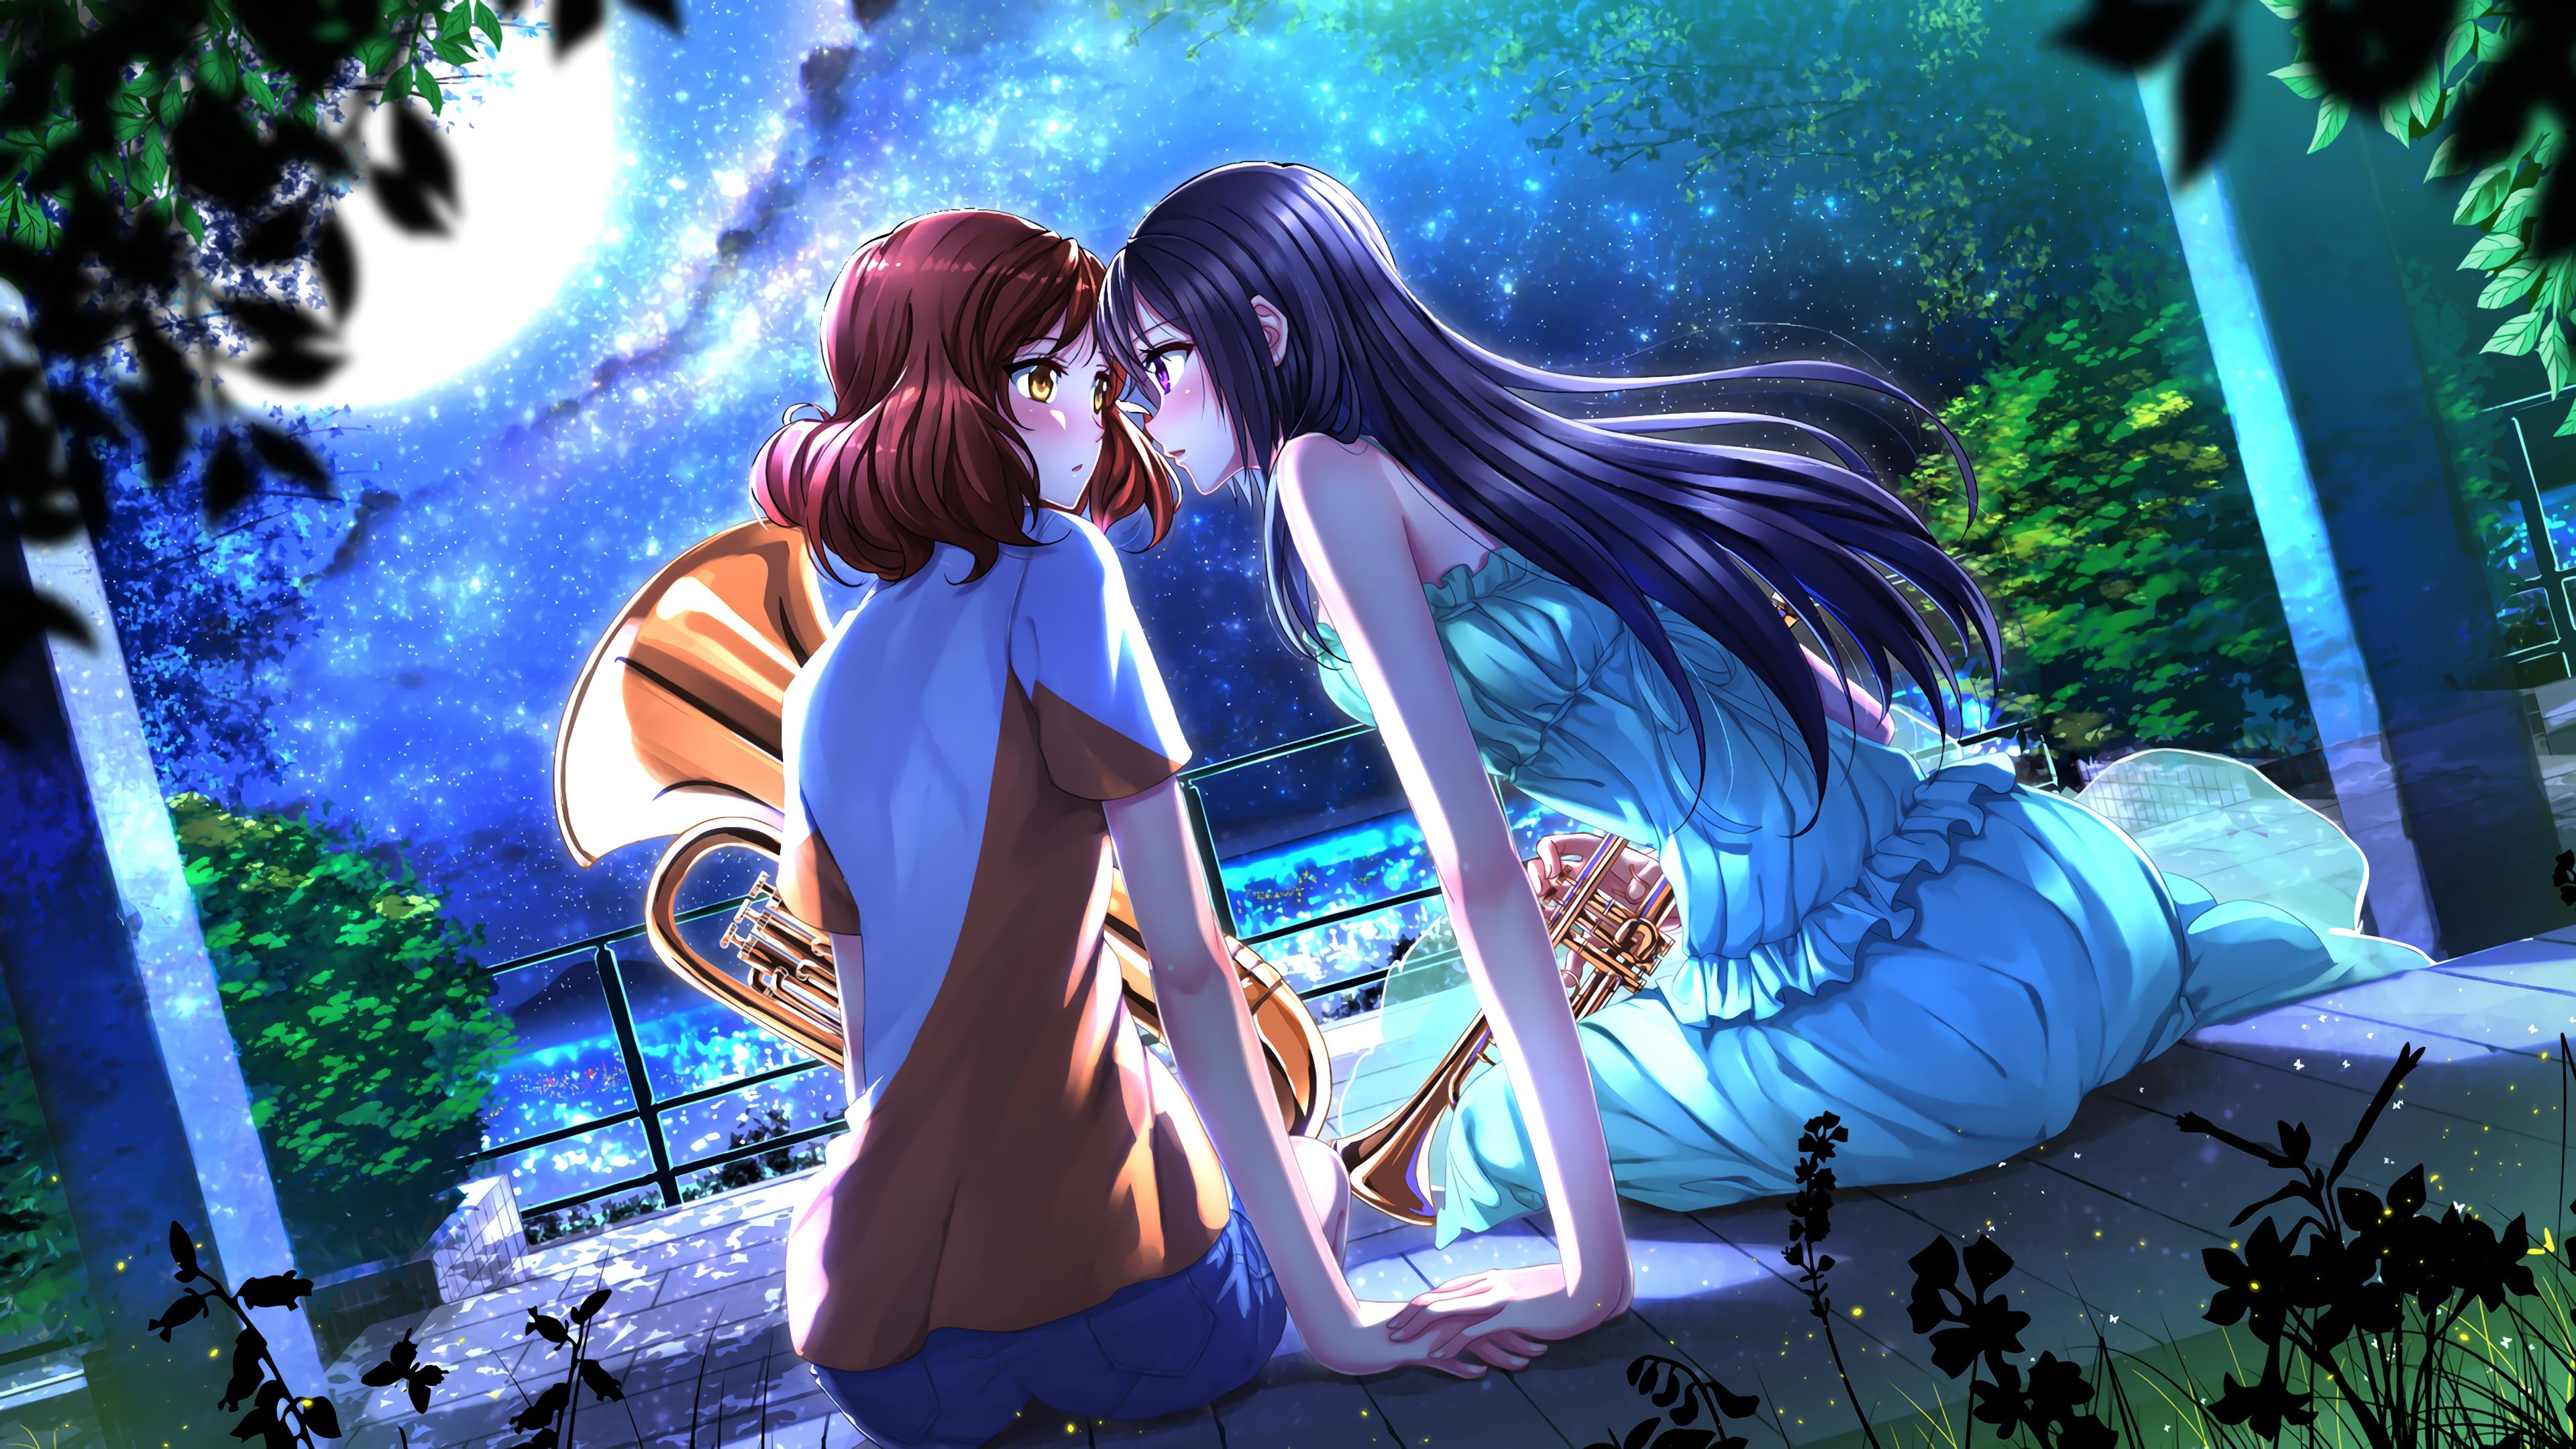 Anime 4K UltraHD Wallpaper - backiee - Free Ultra HD ...